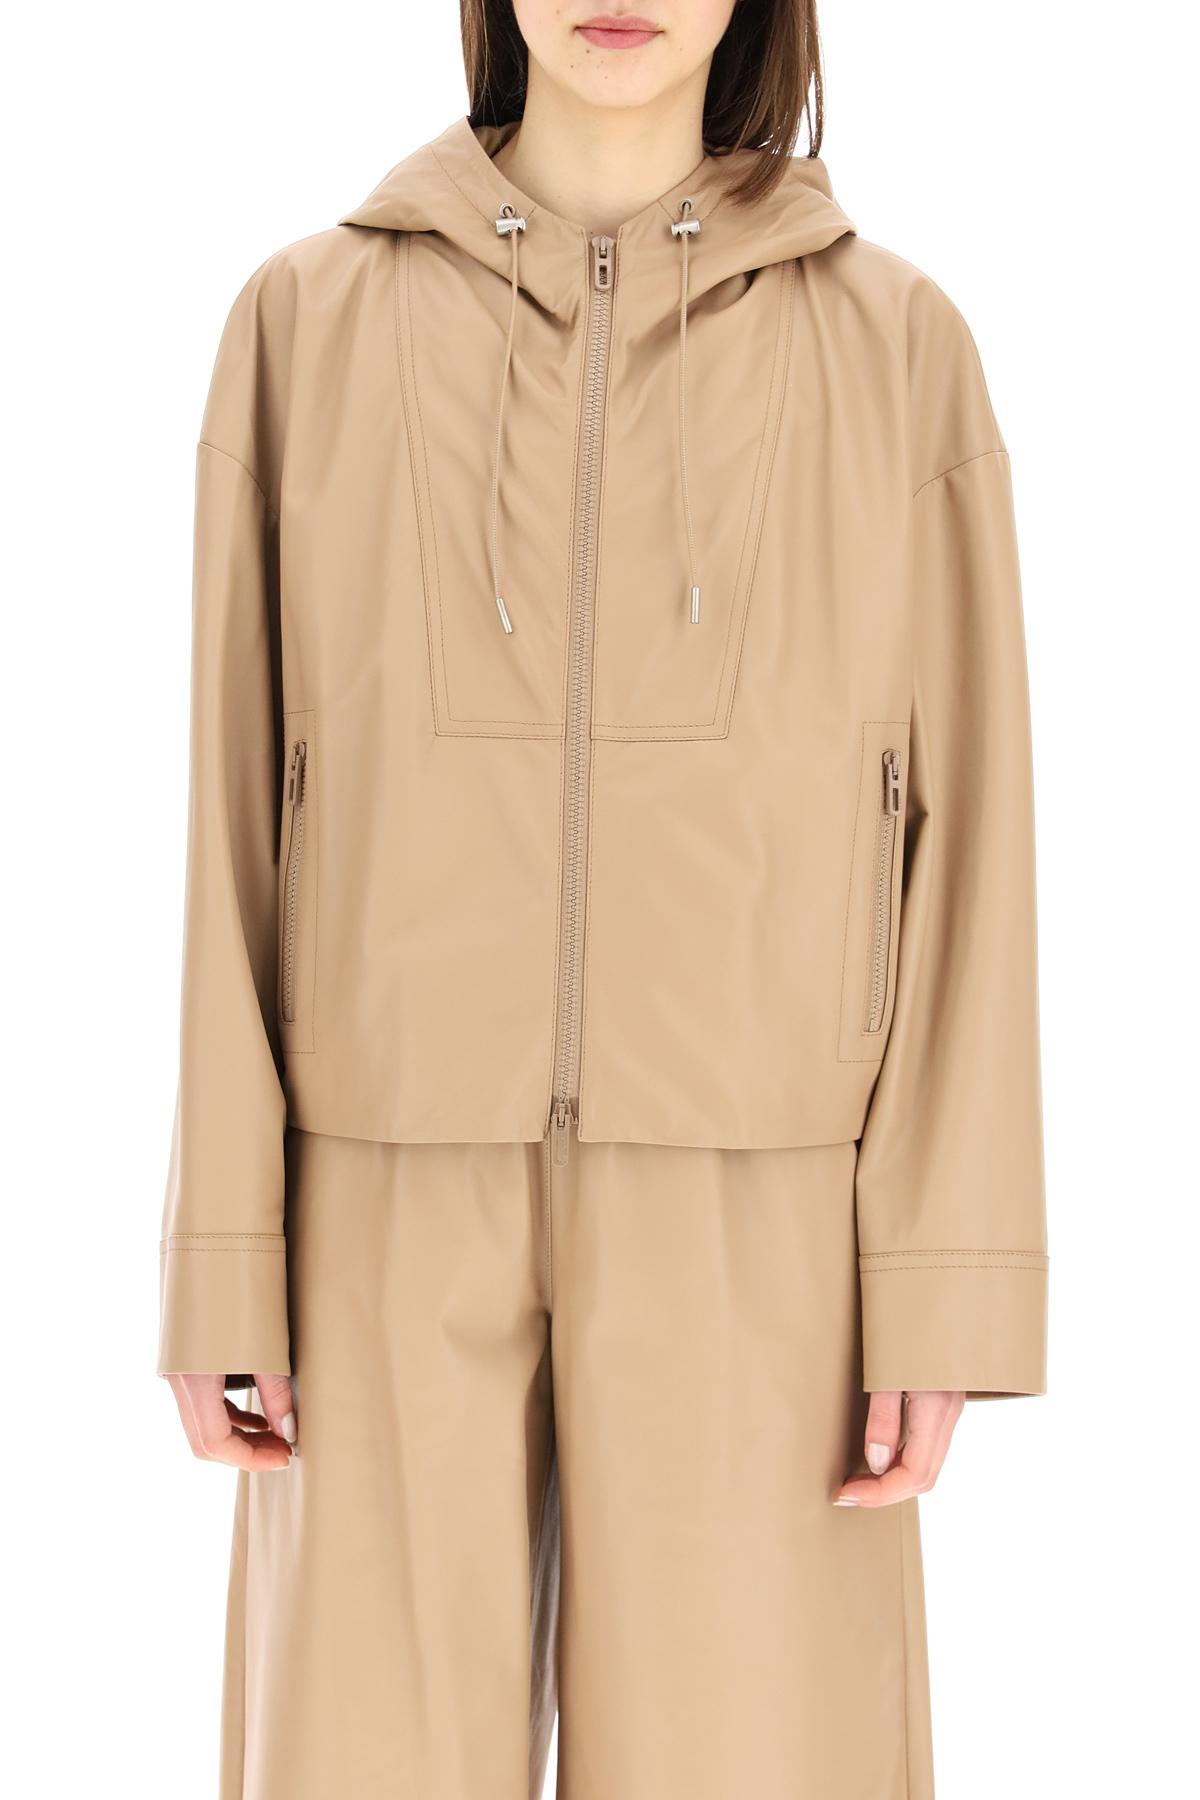 Drome jacket in pelle con cappuccio